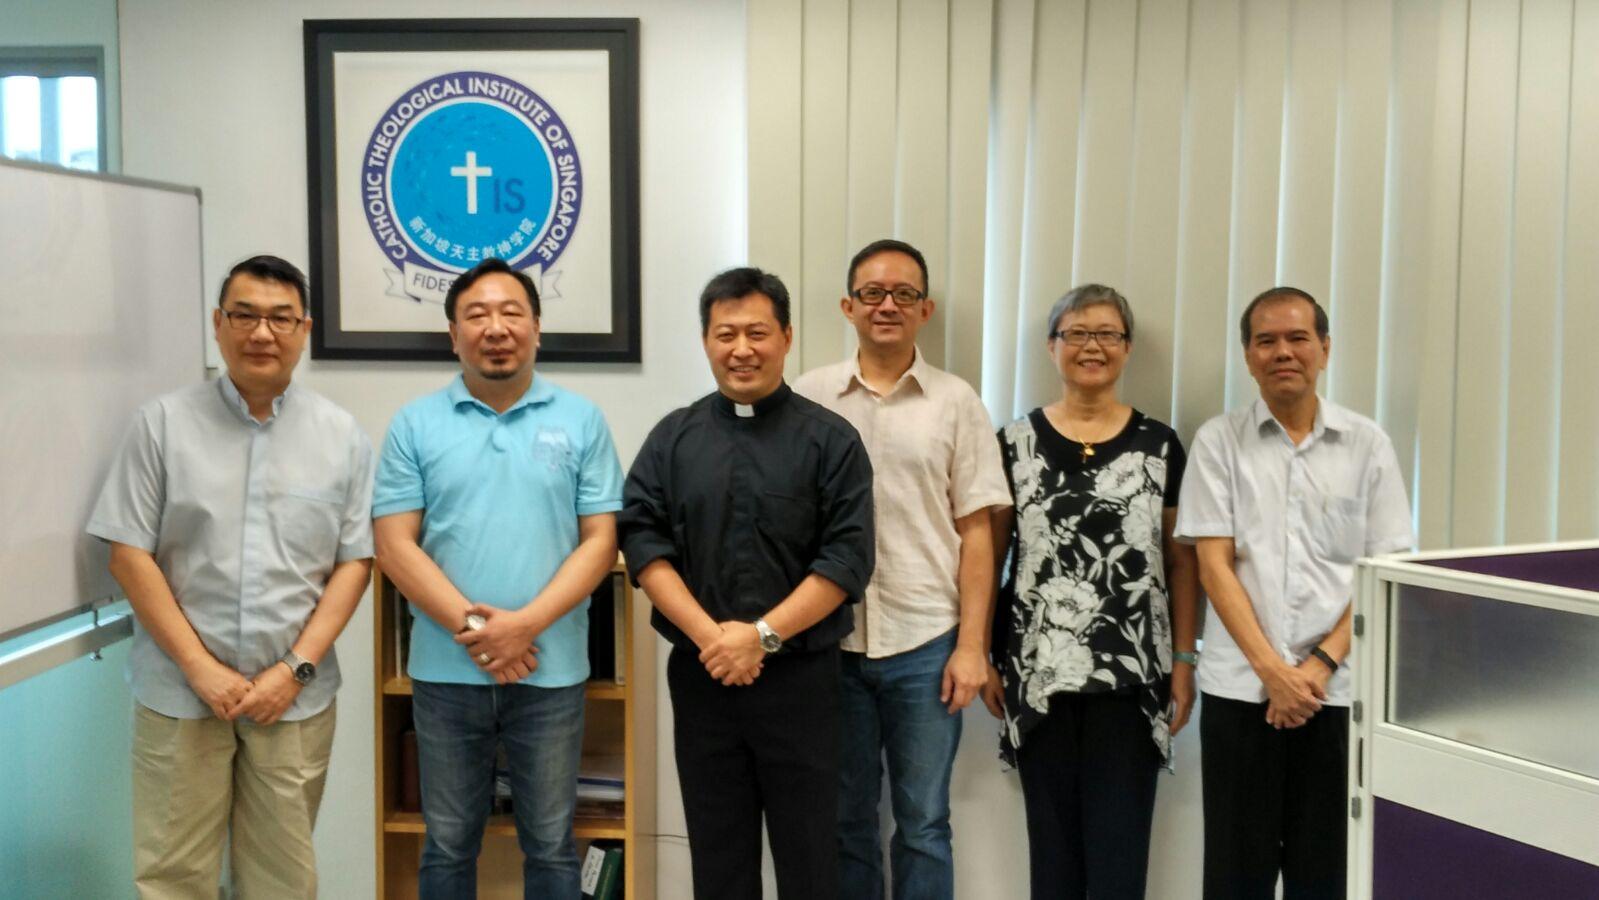 Prof. Ning, Rectors & staff of CTIS